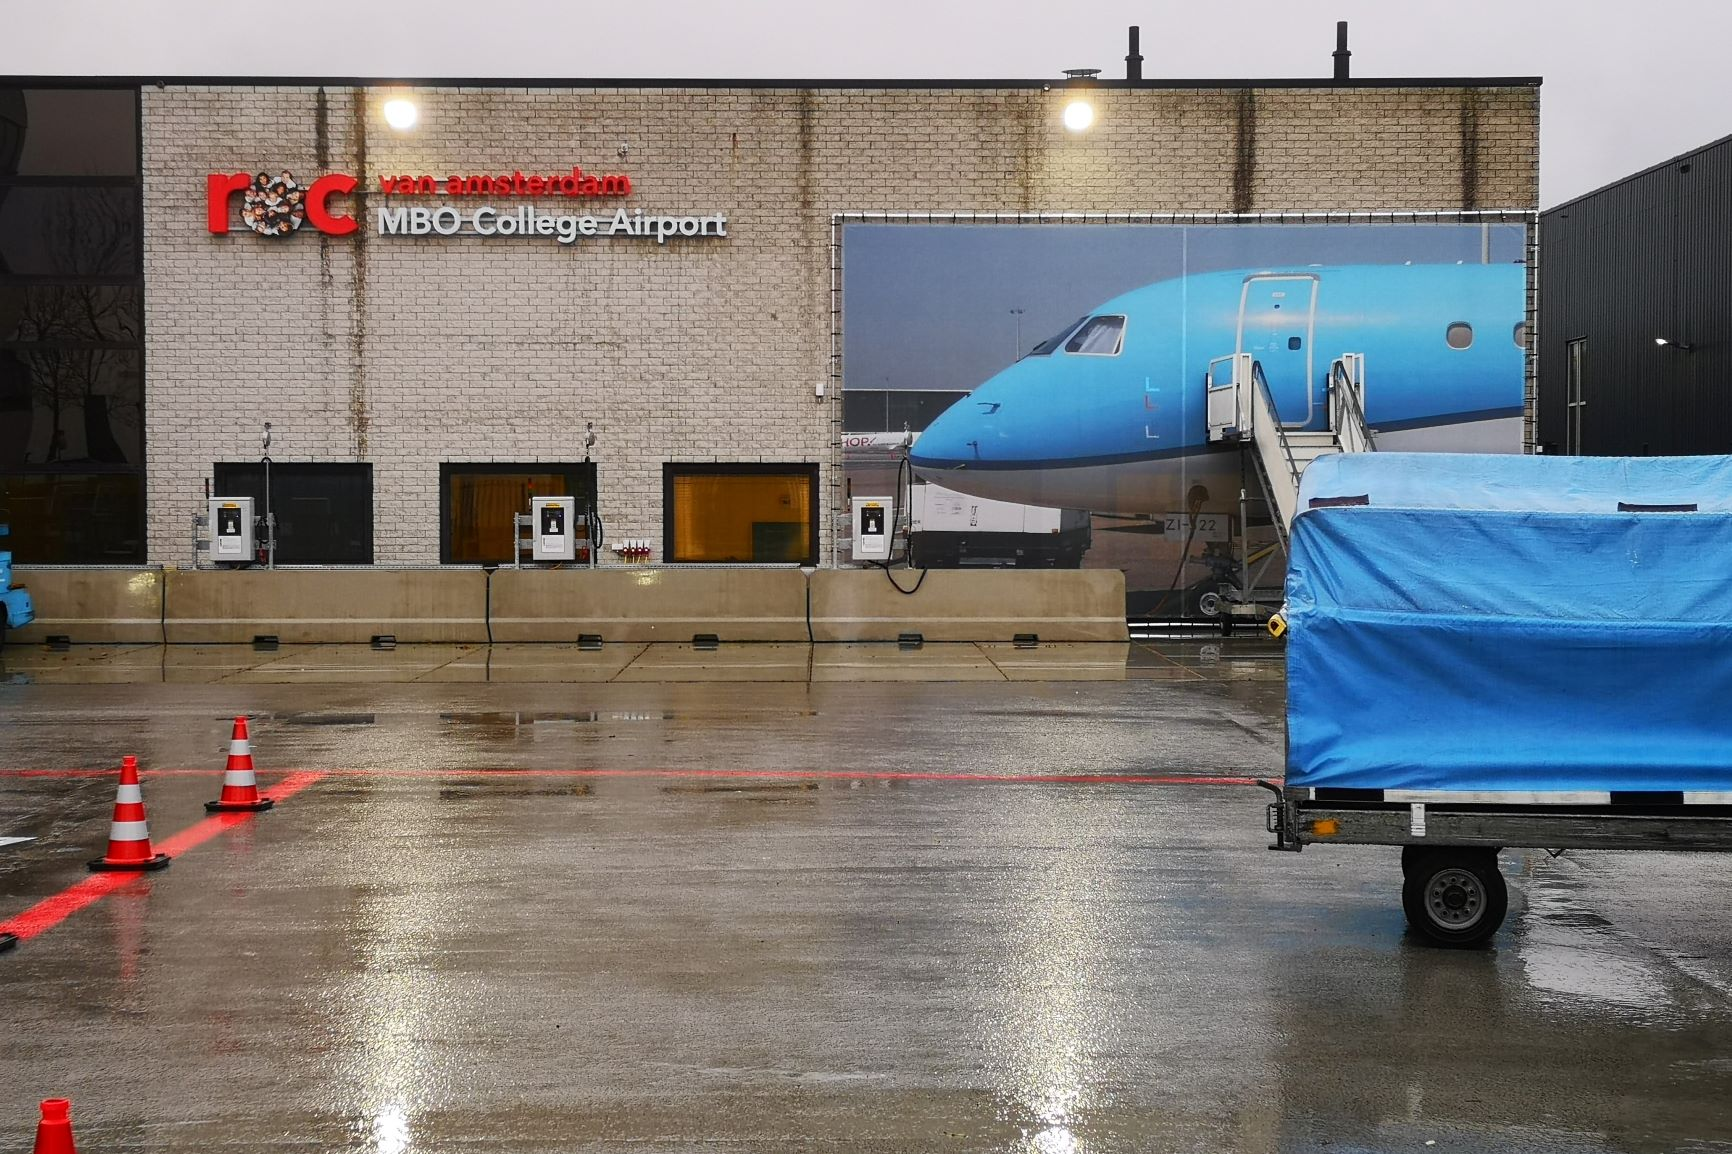 KLM Ground Services Training Center